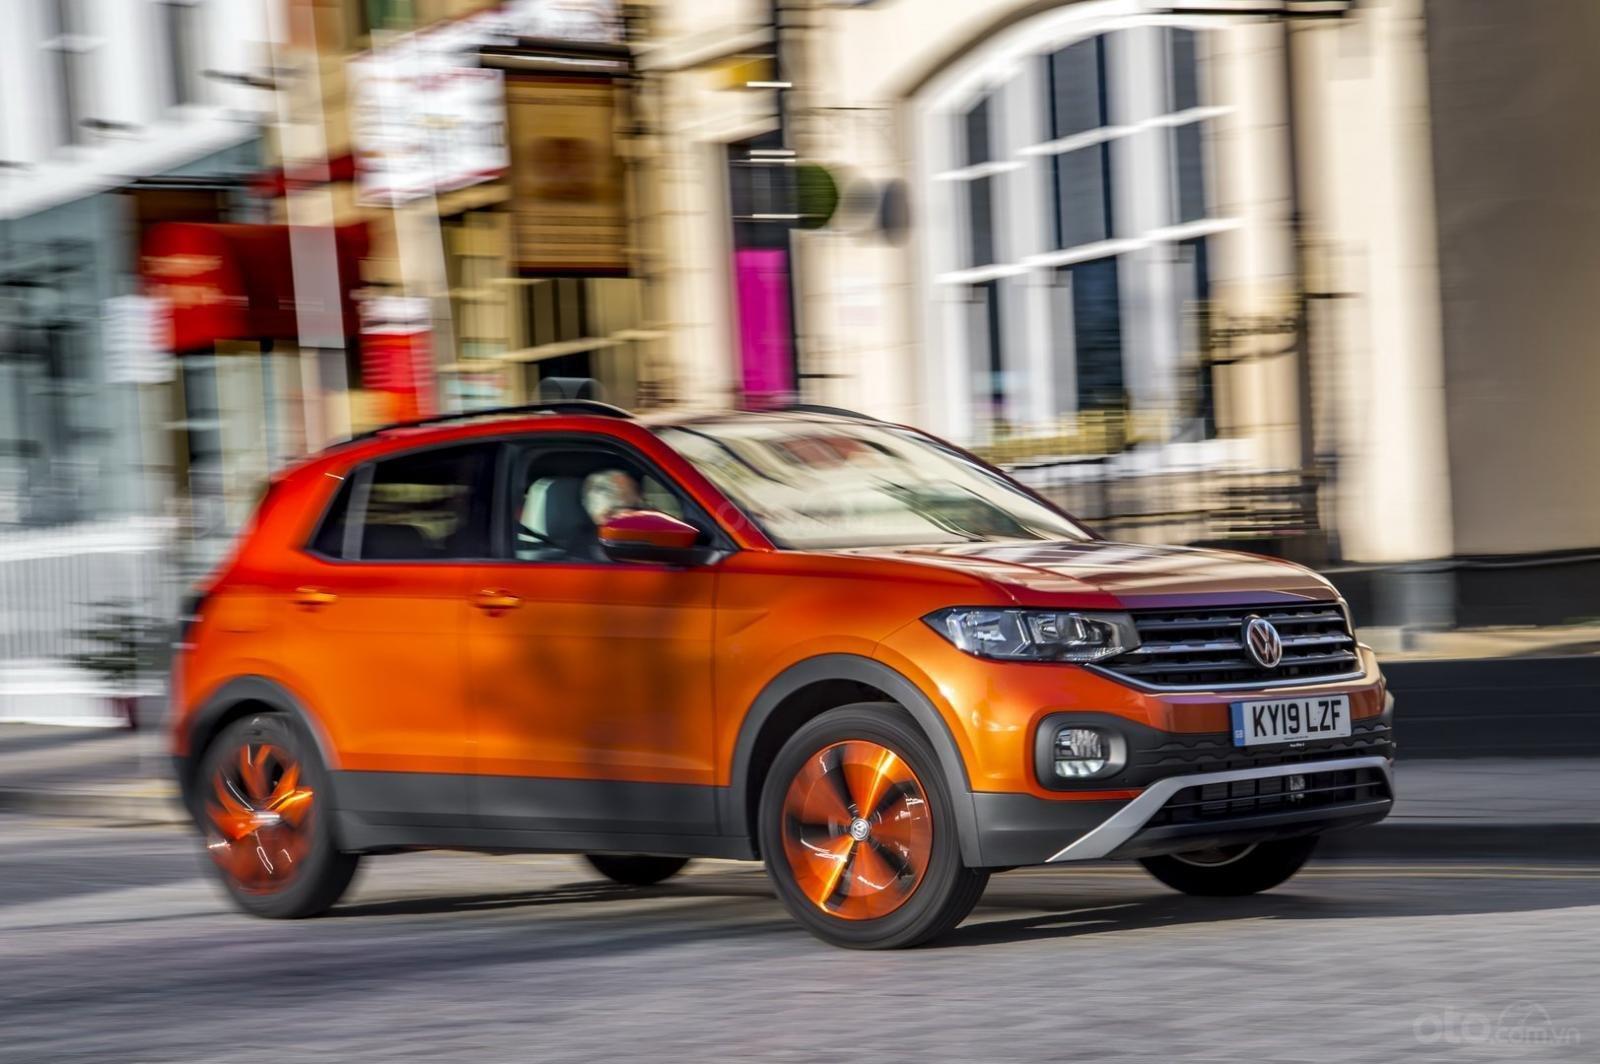 Volkswagen T-Cross 2019 Diesel chào giá từ 631,2 triệu